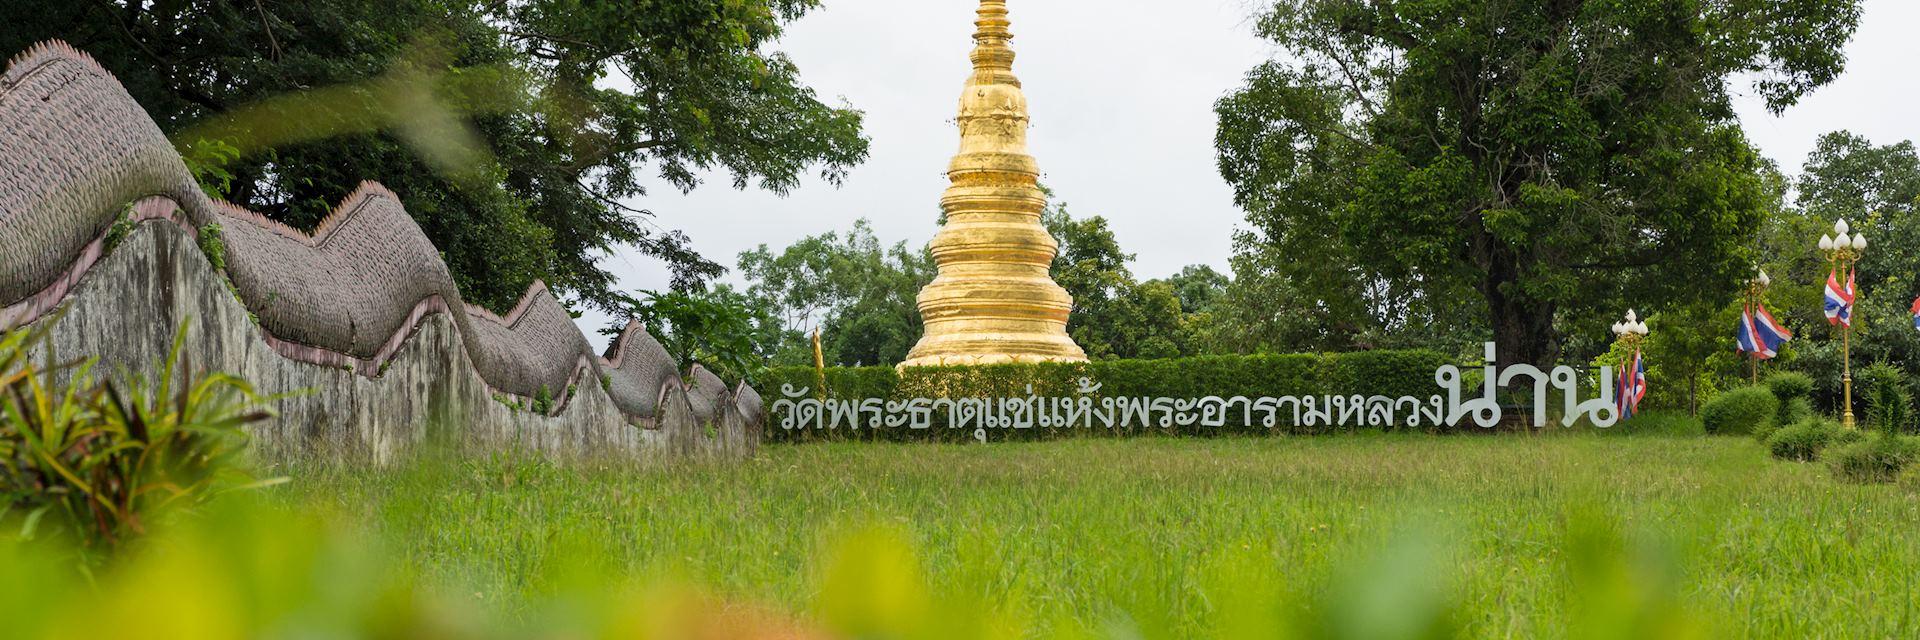 Wat Phrathat Chae Haeng temple, Nan